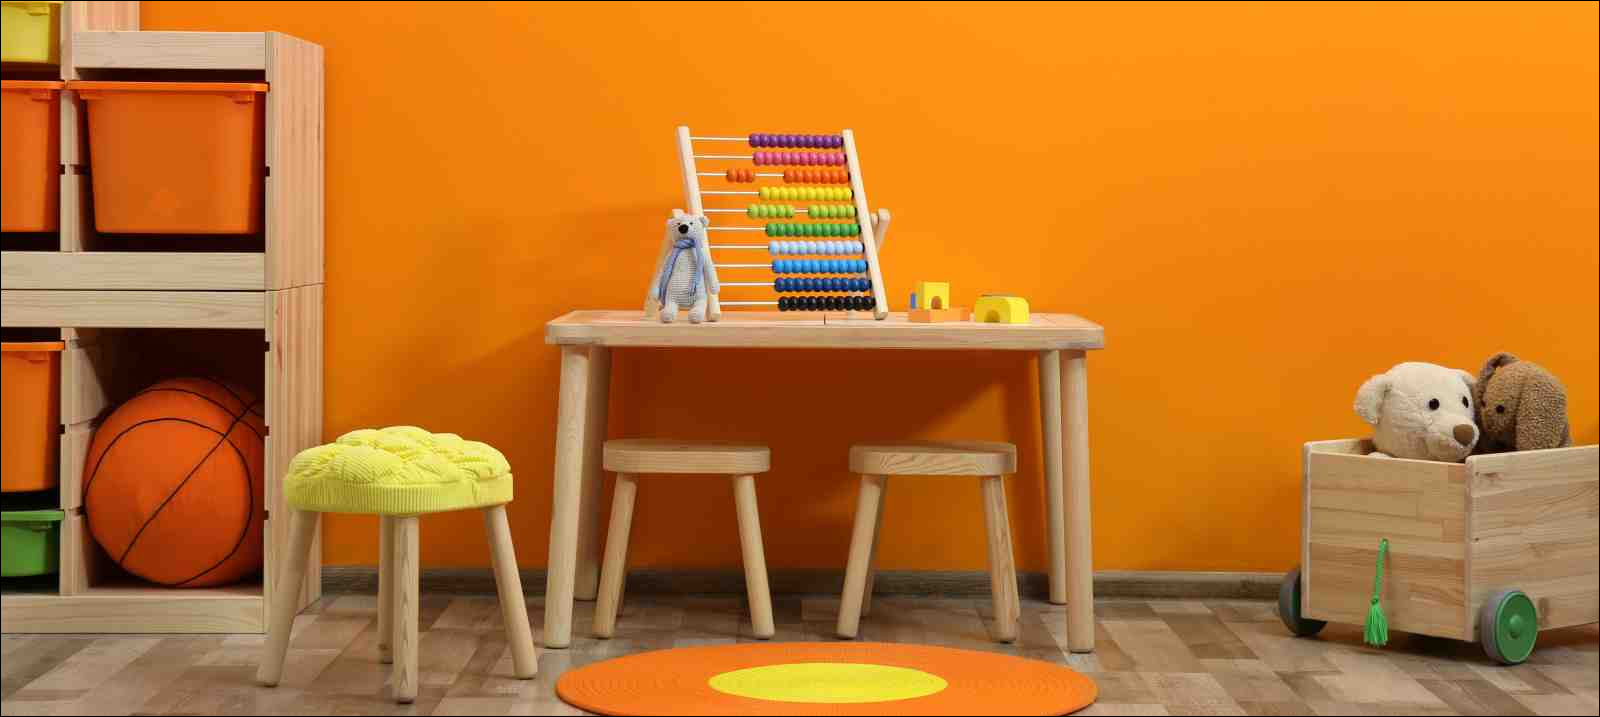 kid's playroom with orange walls